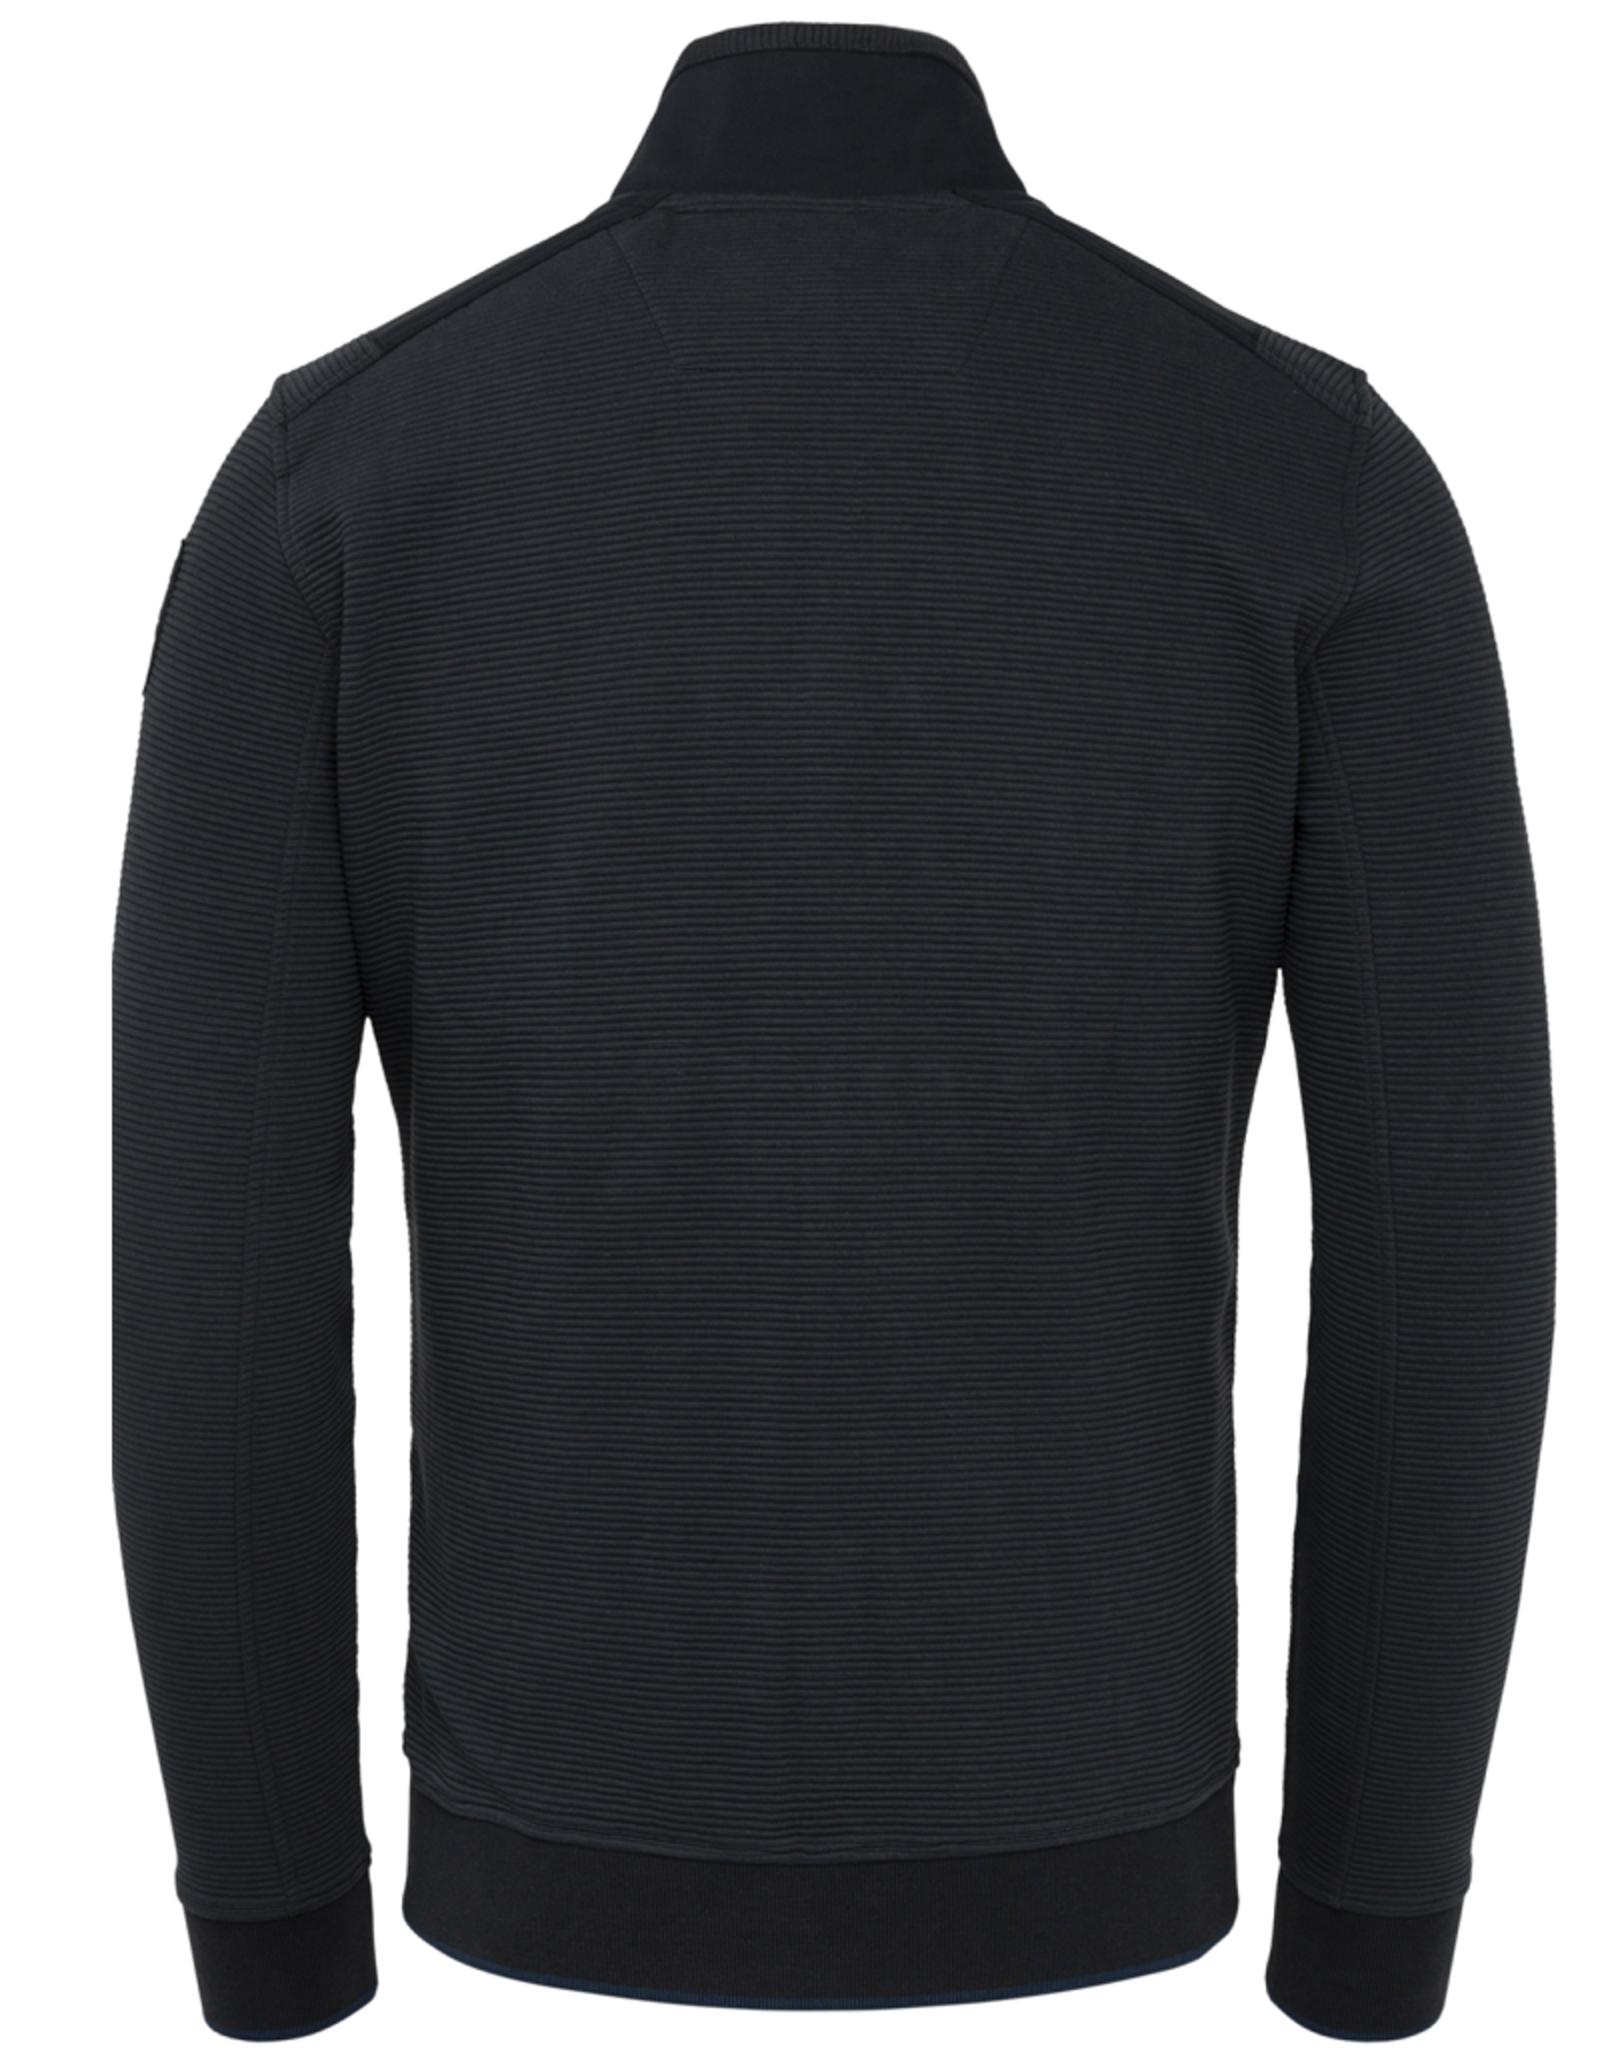 Pme Legend PME Legend vest Zipper Ottoman sweat blauw